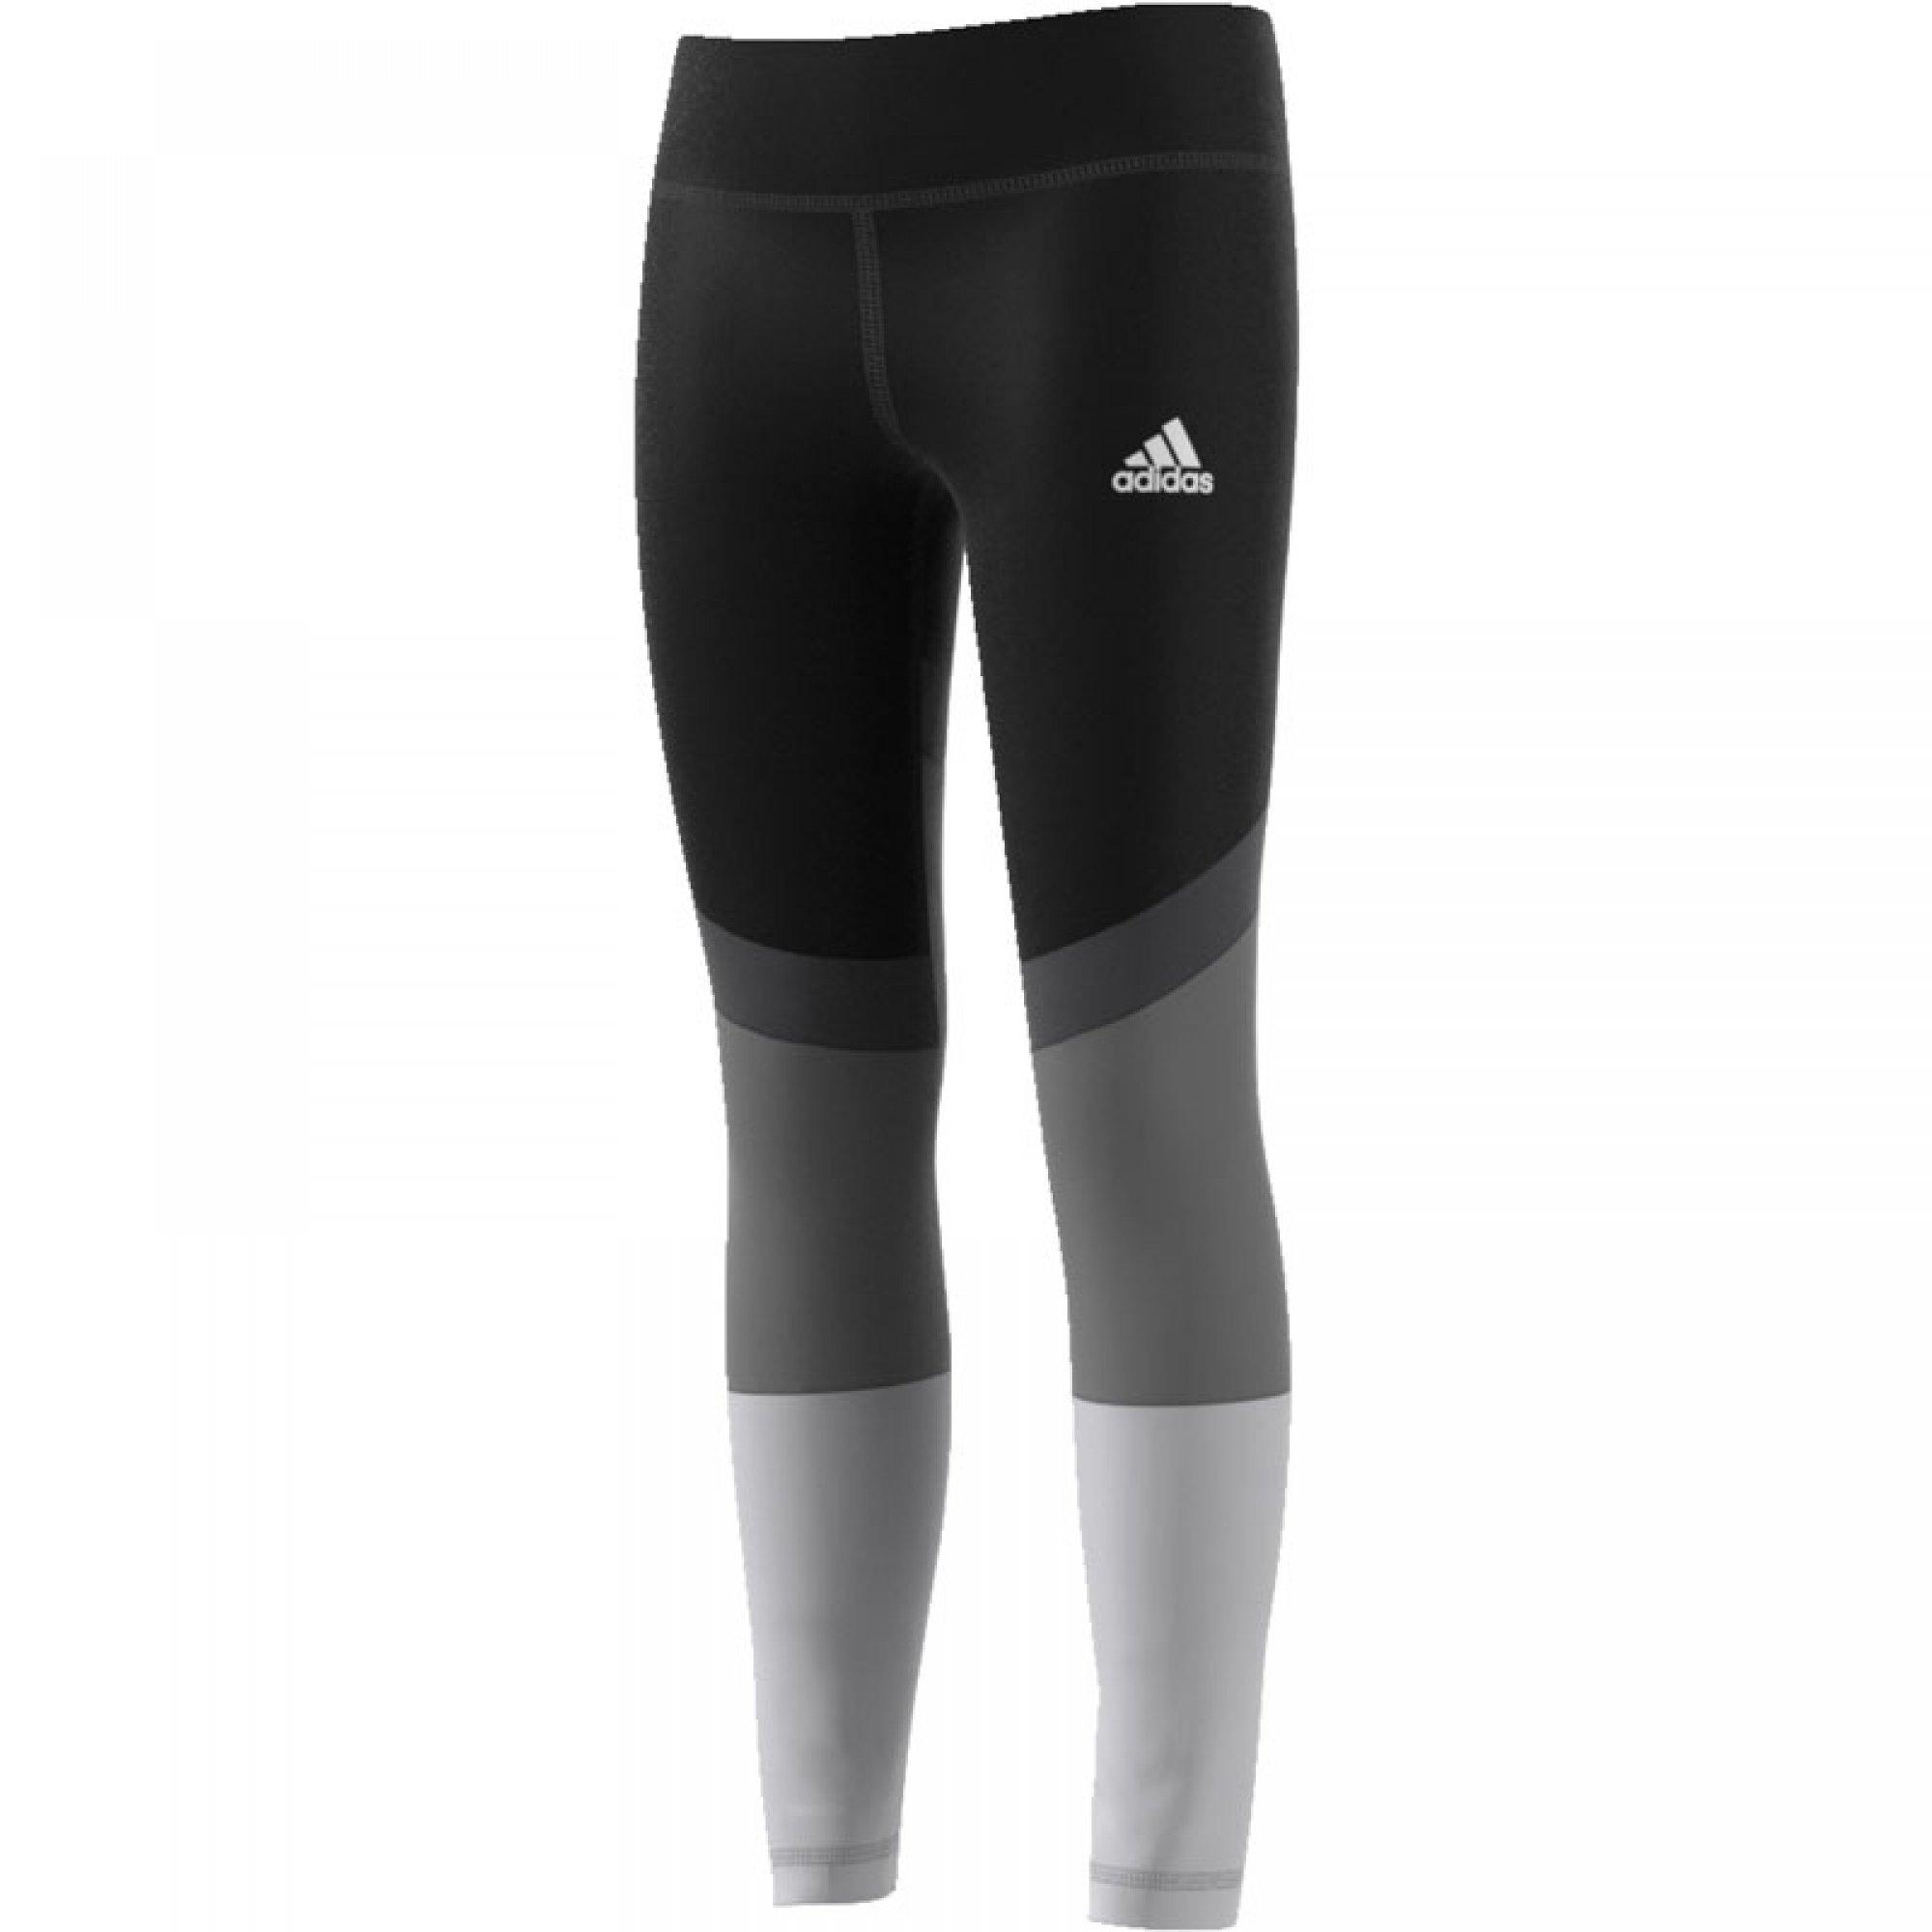 73850bc1928 Αθλητισμός > Γυναικεία > Ρούχα > Παντελόνια > Κολάν / adidas Wow ...